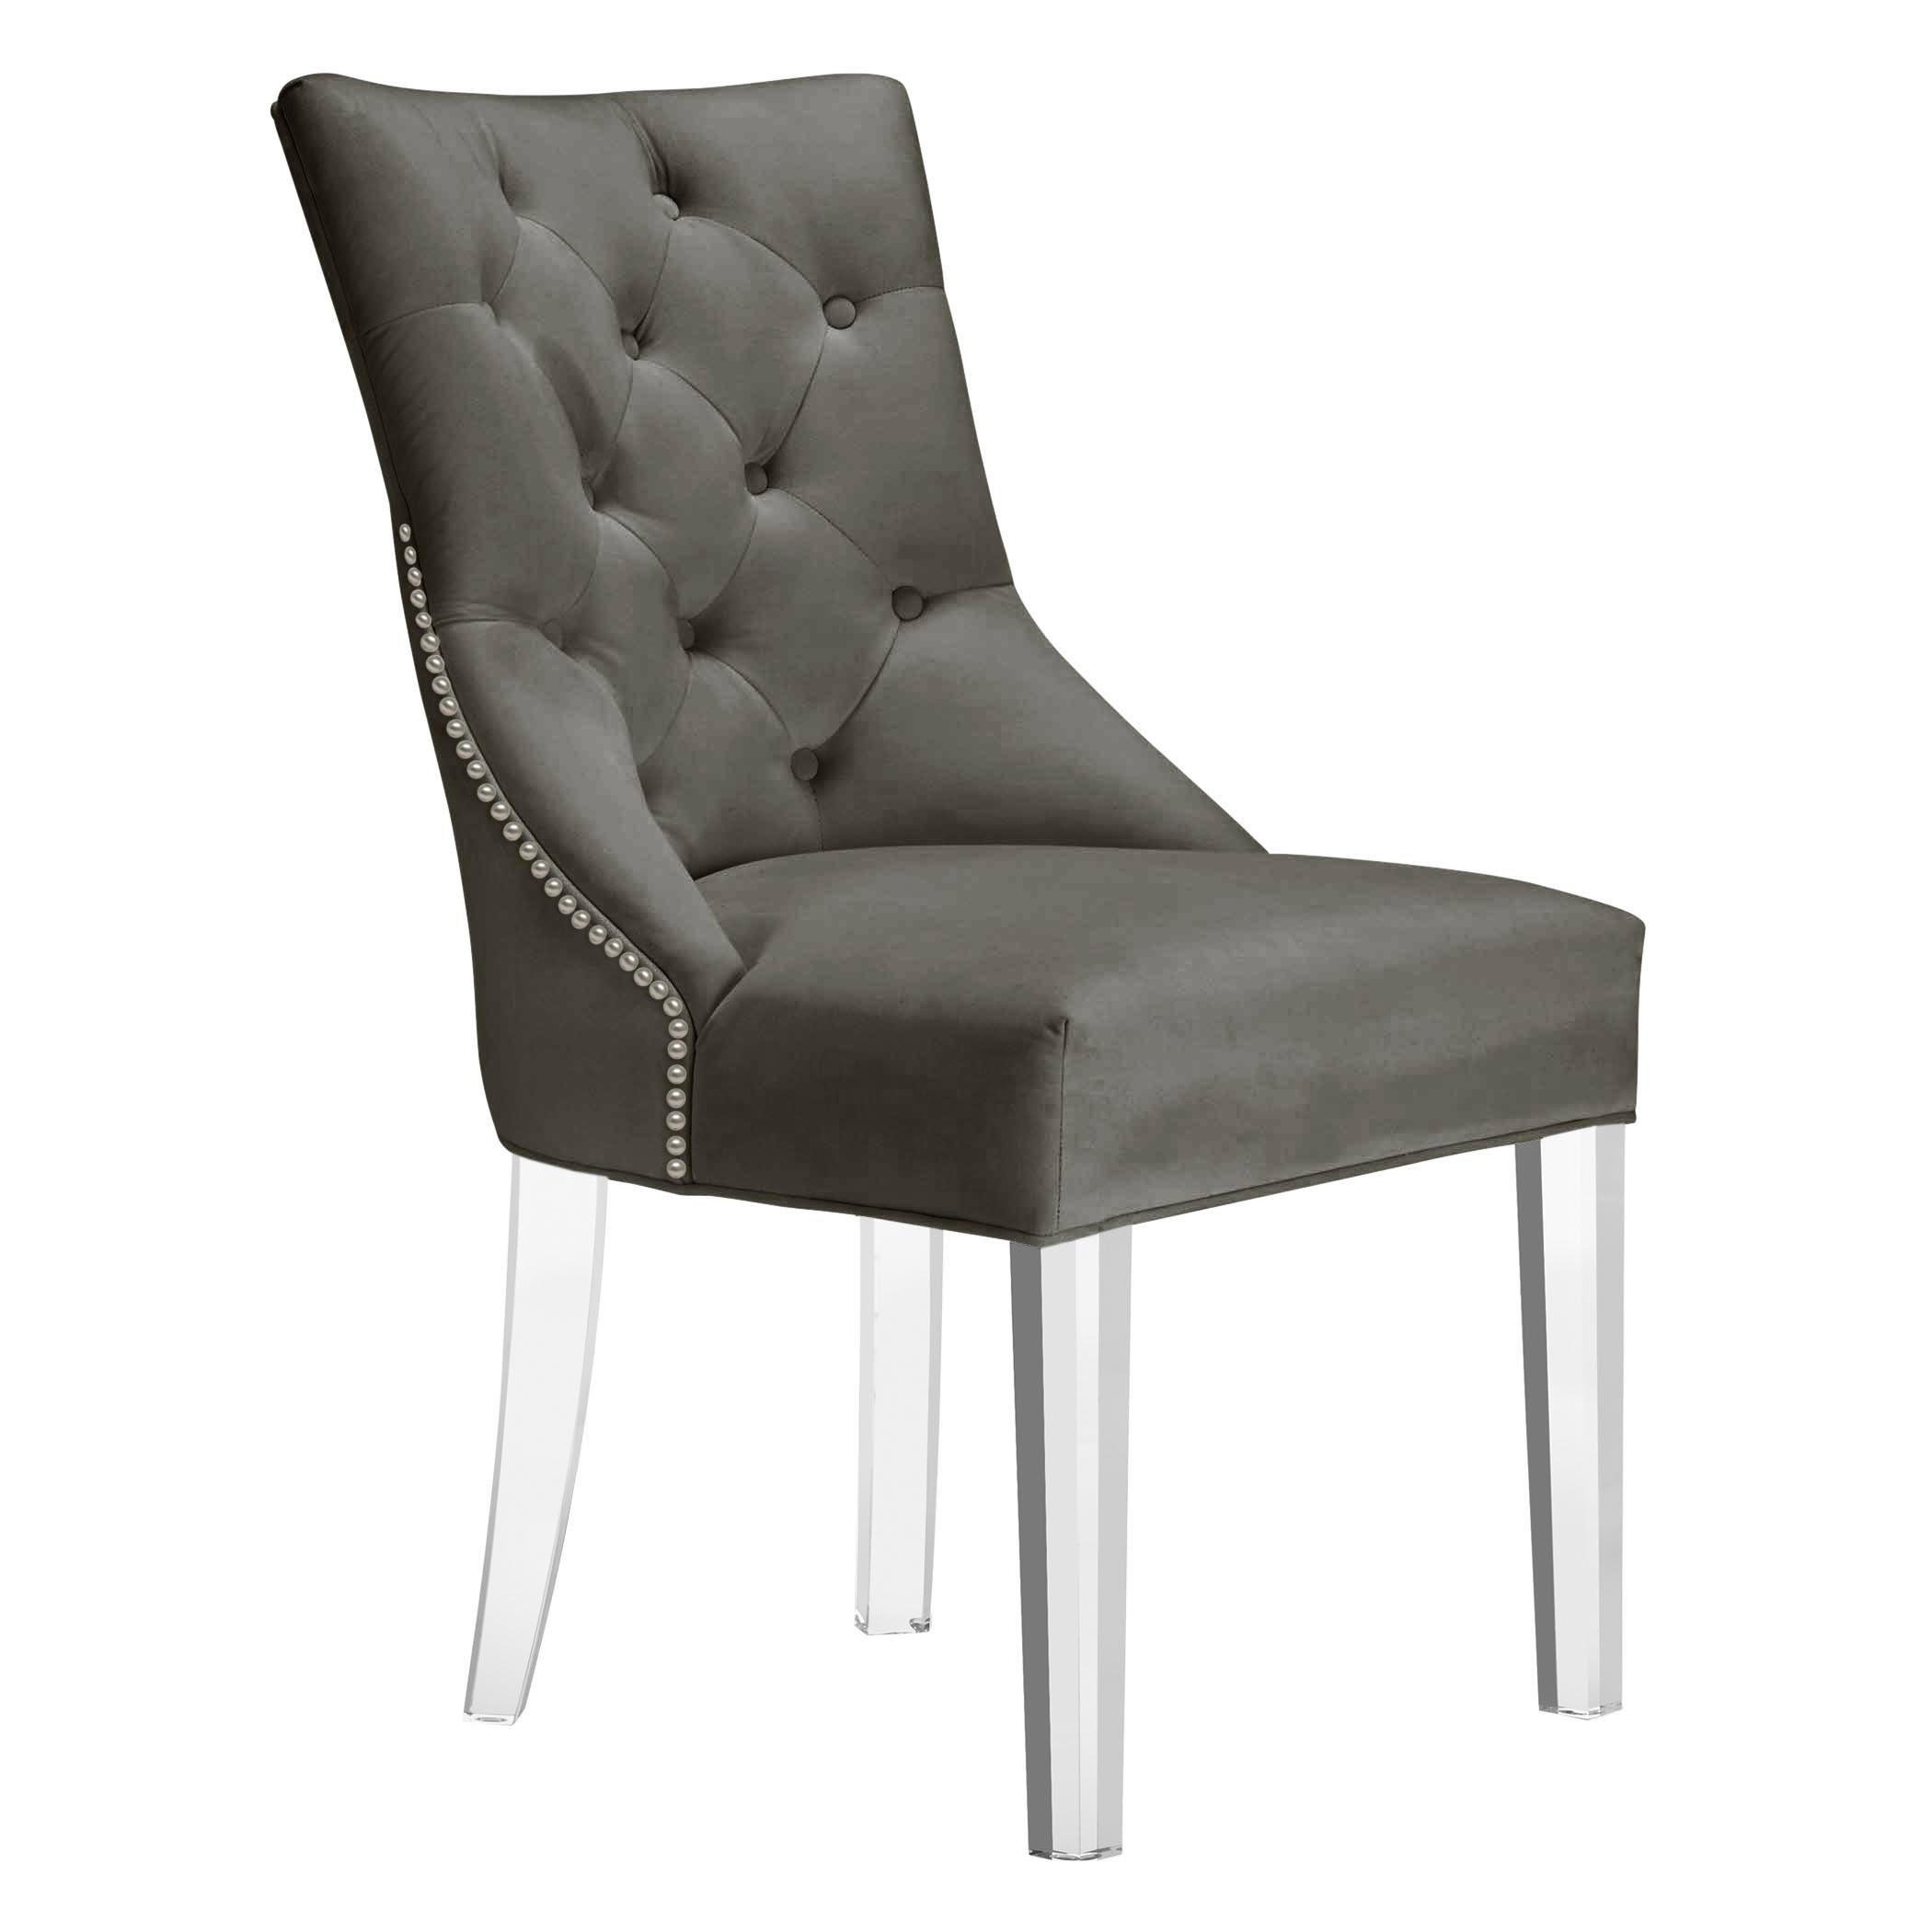 Nottingham Dining Chair - Acrylic